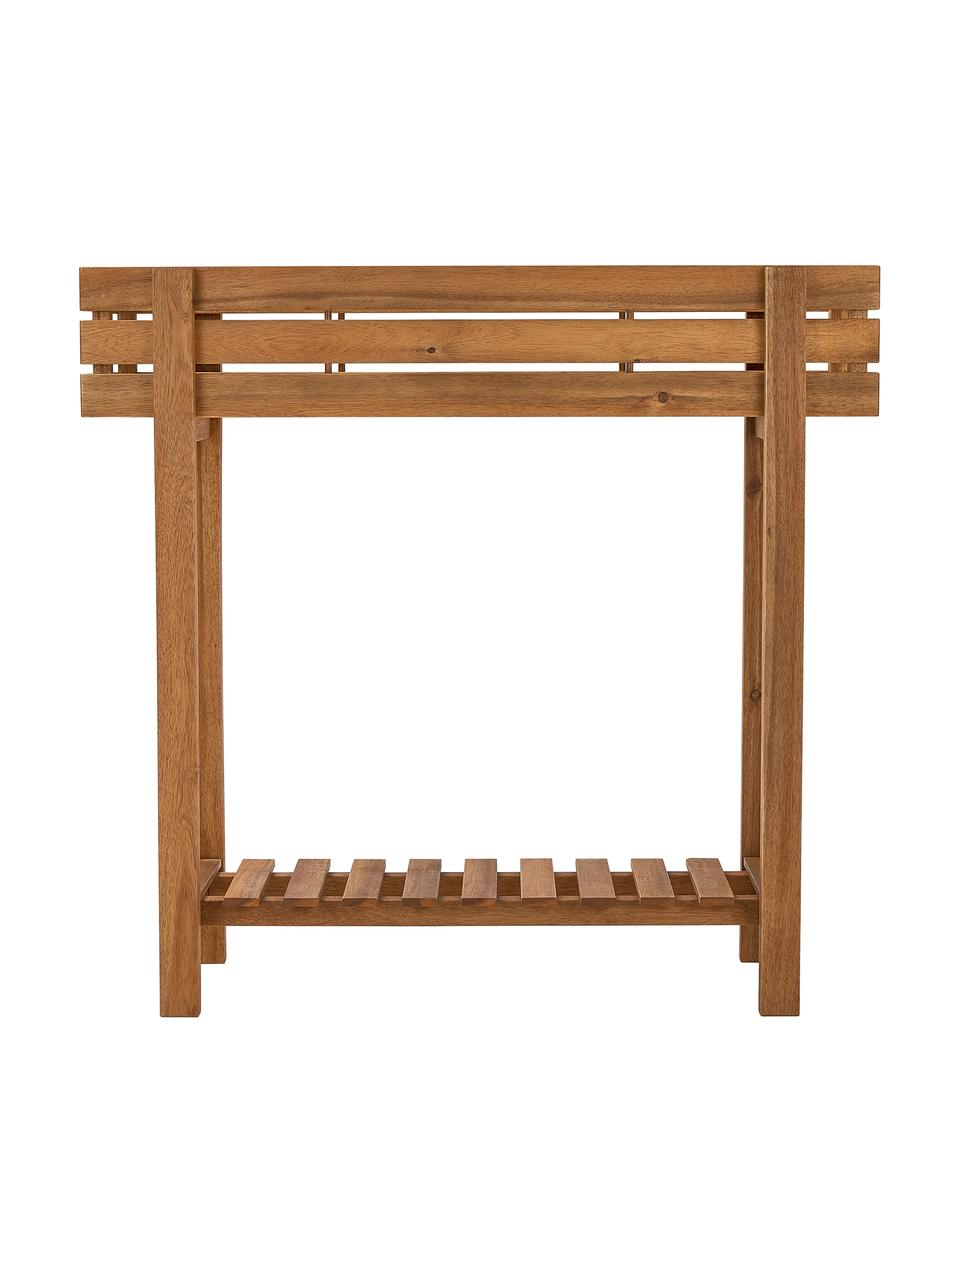 Holz-Pflanzkasten New Gardening, Akazienholz, geölt, Akazienholz, 90 x 85 cm